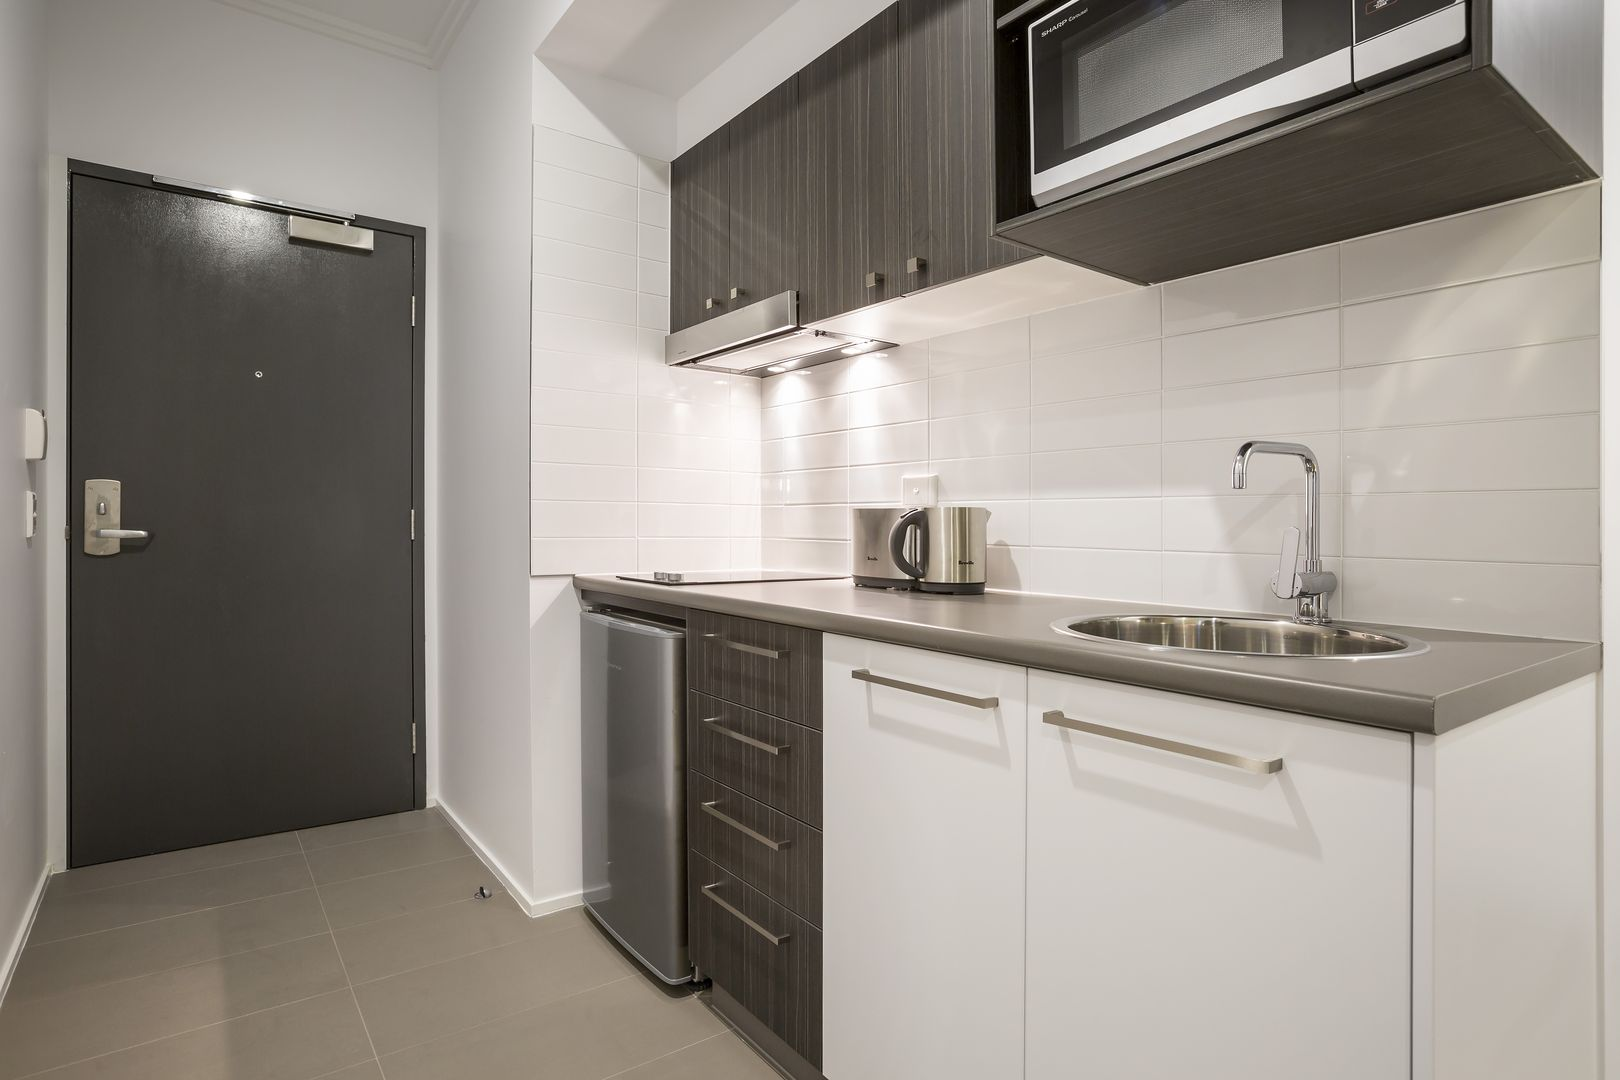 27 Gordon Street, Mackay QLD 4740, Image 2